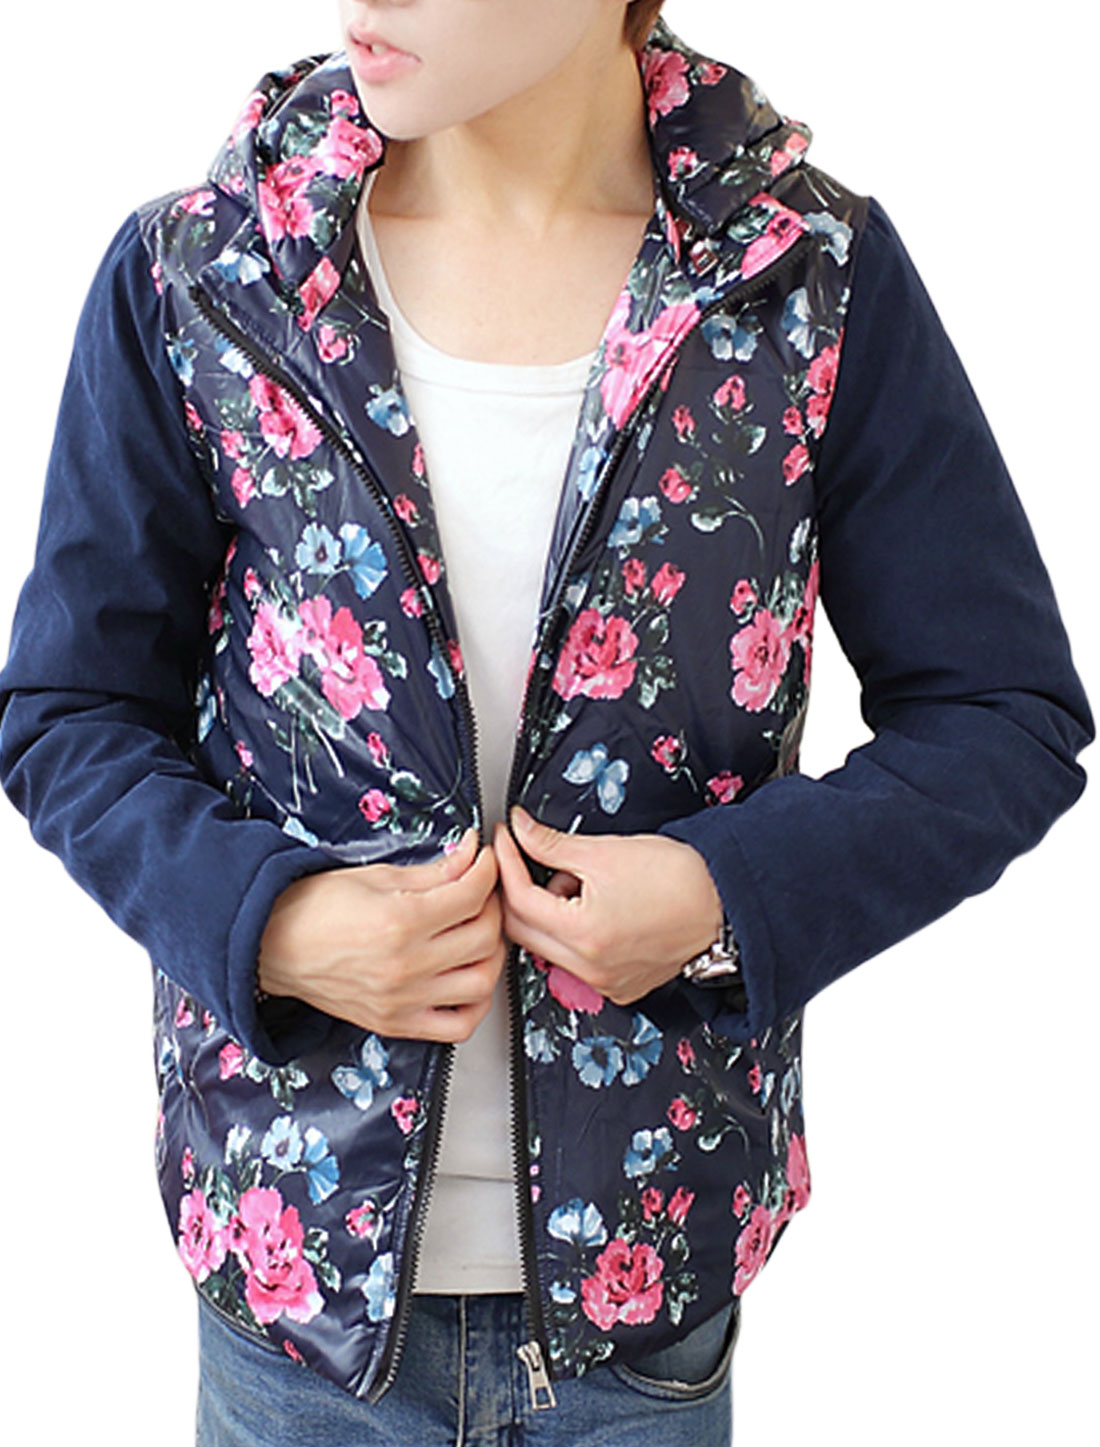 Men Navy Blue Zip Up Floral Prints Front Pockets Splice Hooded Padded Coat M